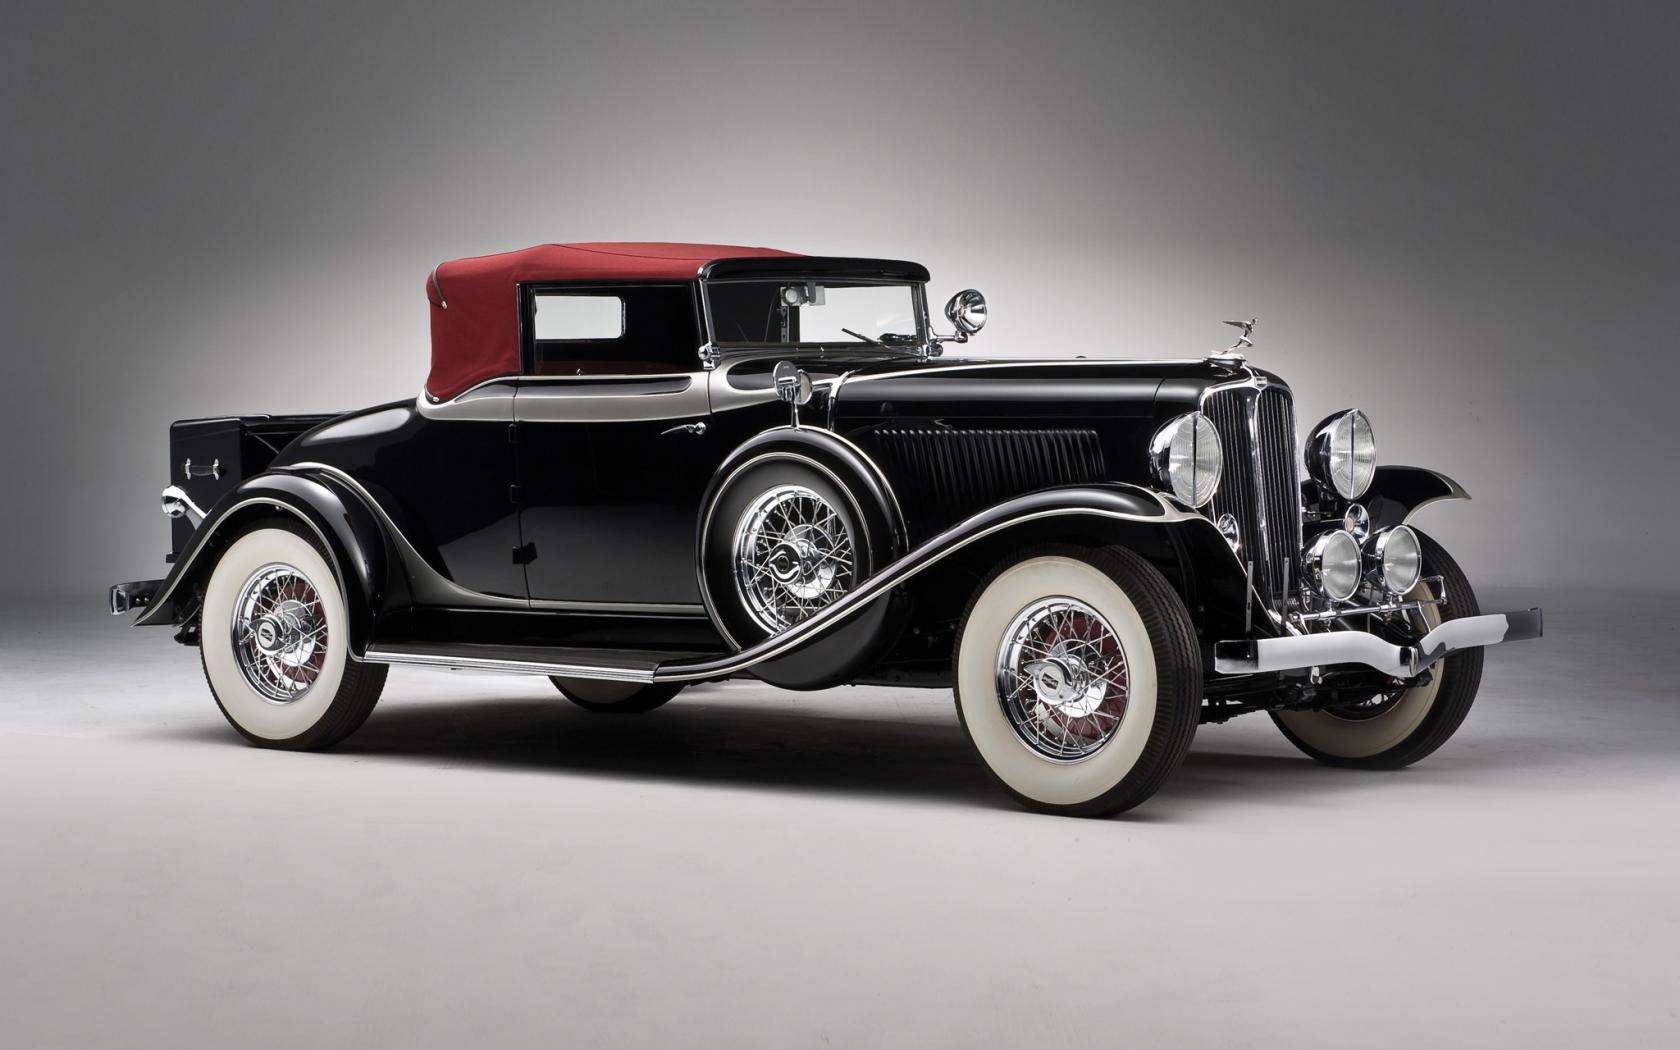 Classic Cars Wallpaper 1680x1050